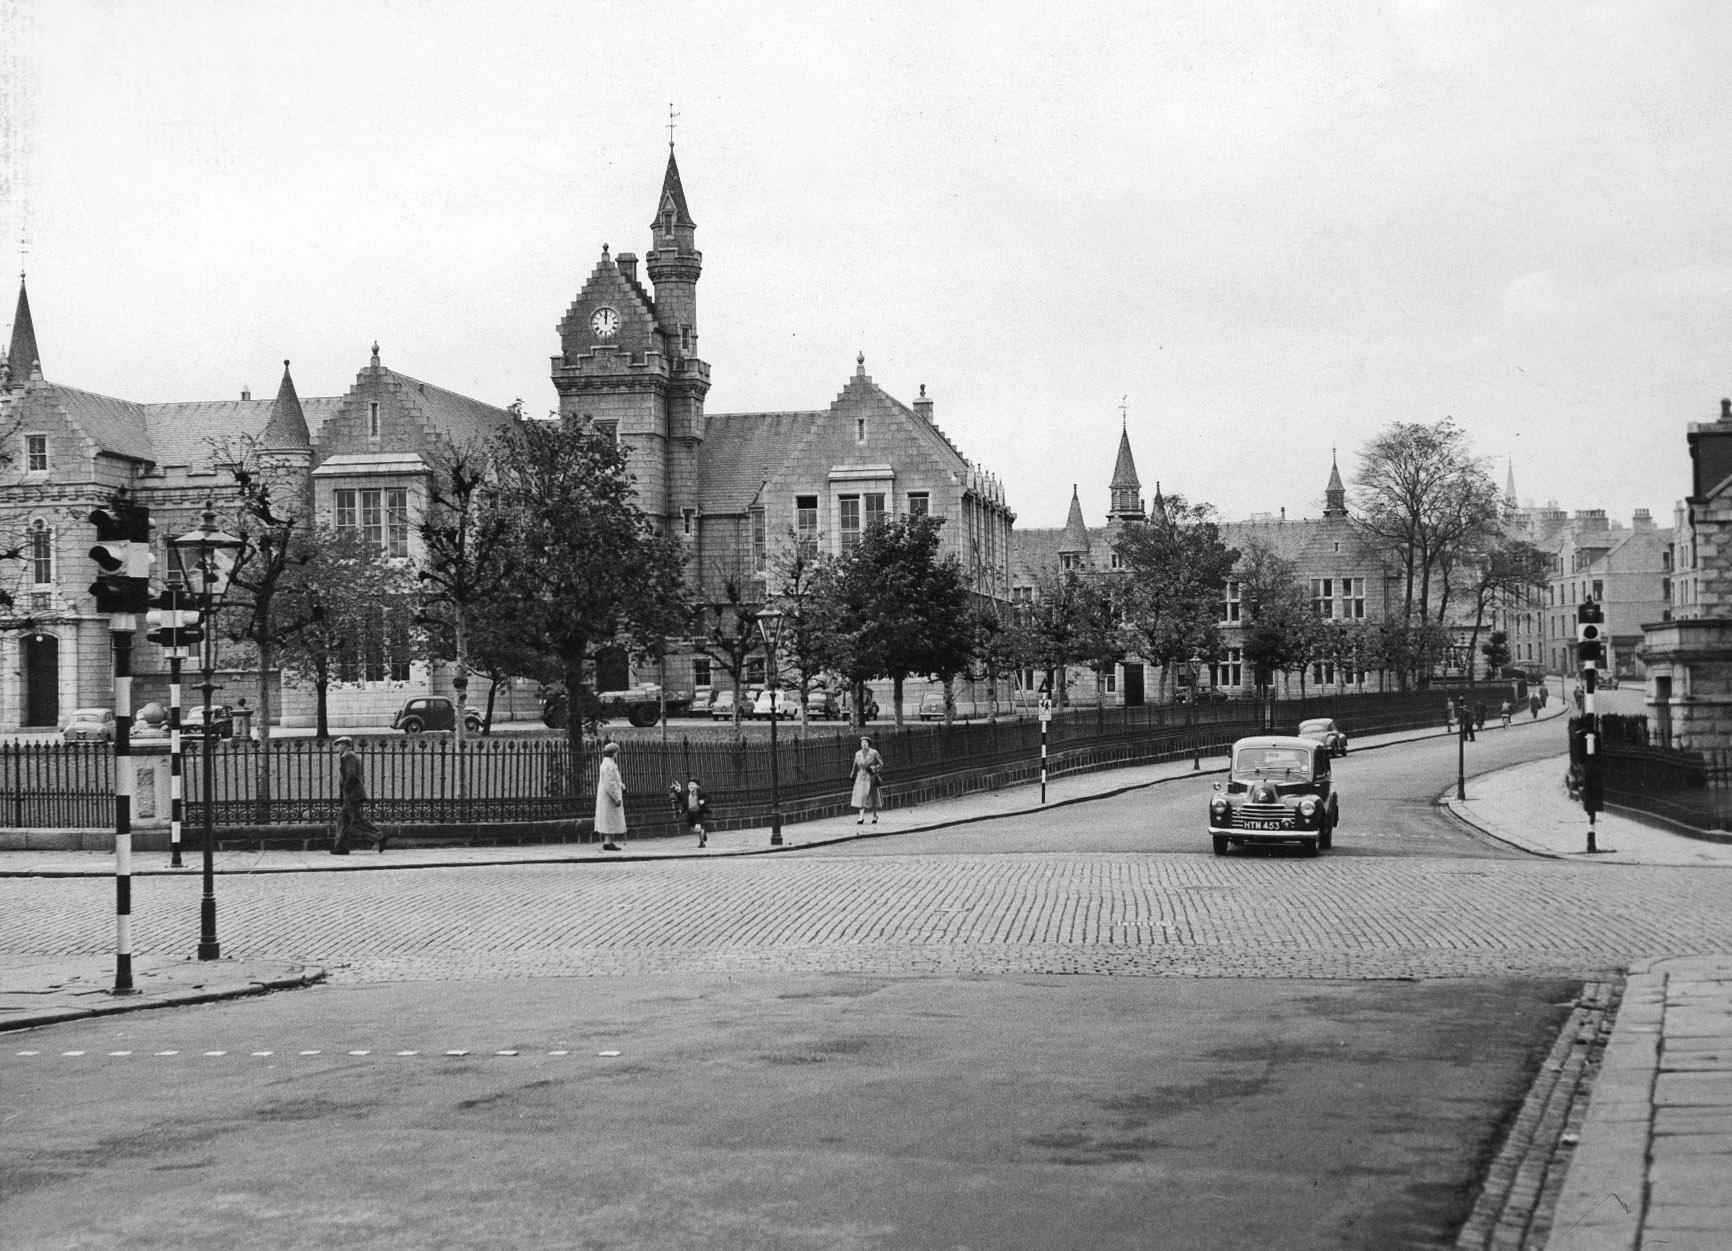 Aberdeen Grammar School on October 29, 1958